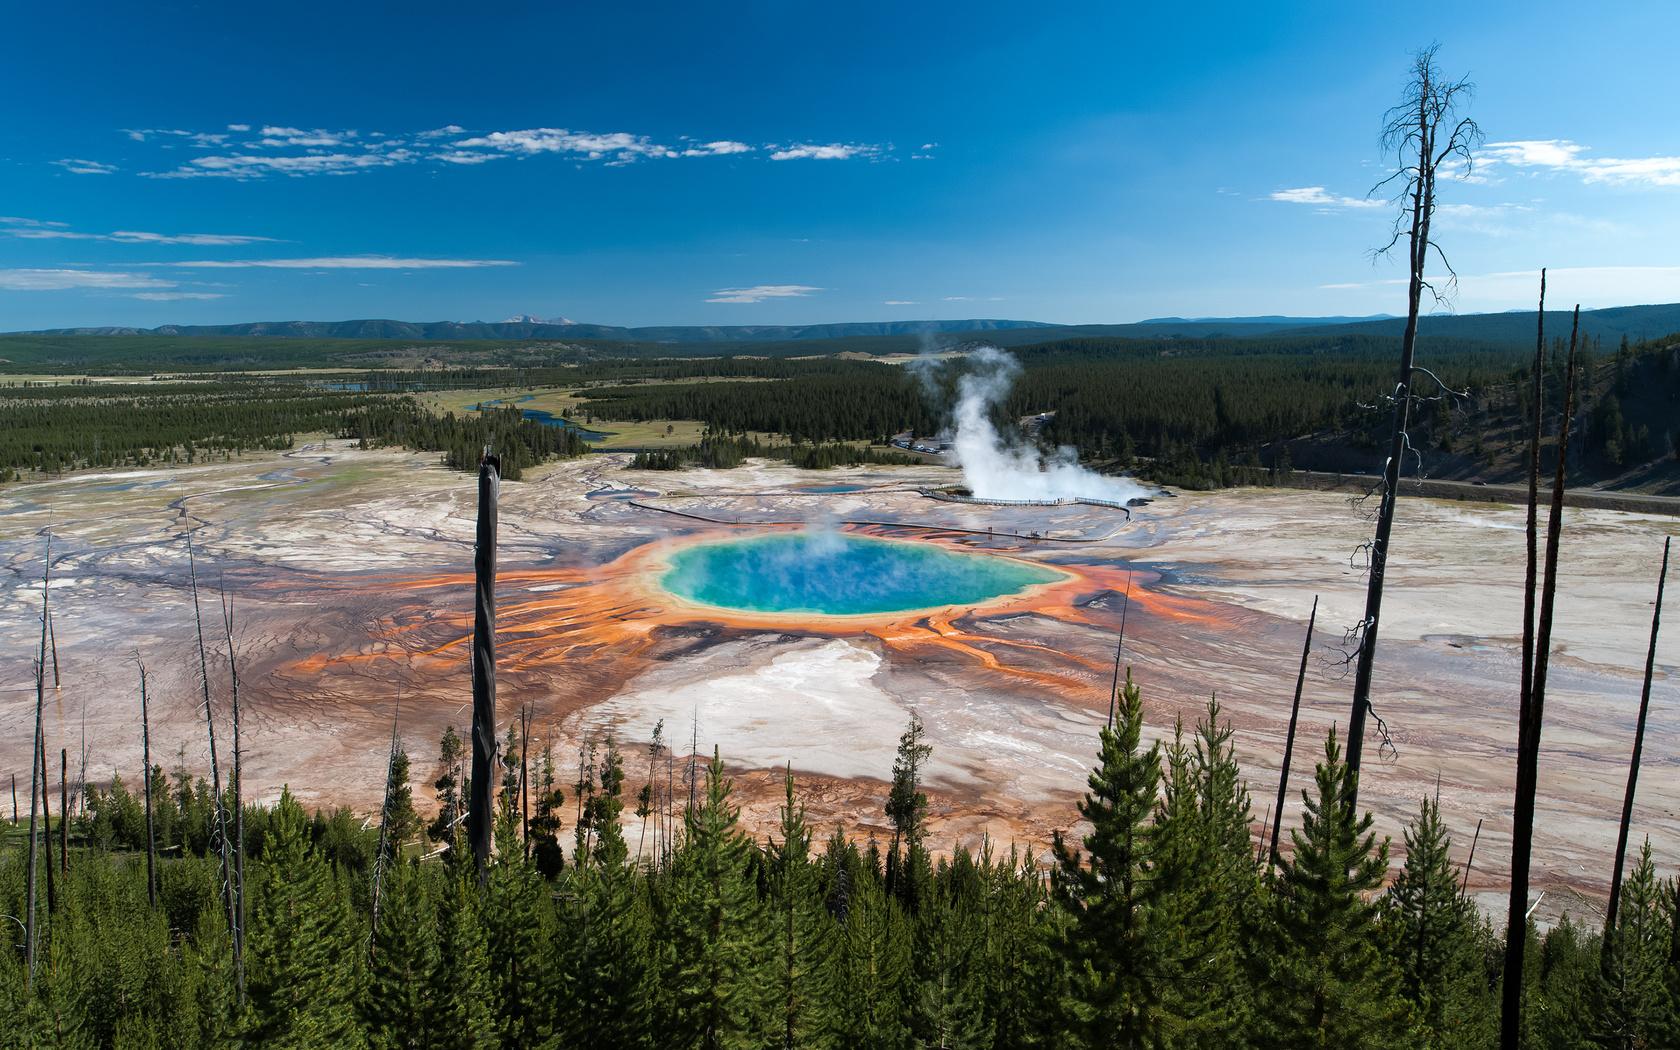 природа, озеро, горы, весна, гейзер, park, trees, national, сша, grand, yellowstone, geyser